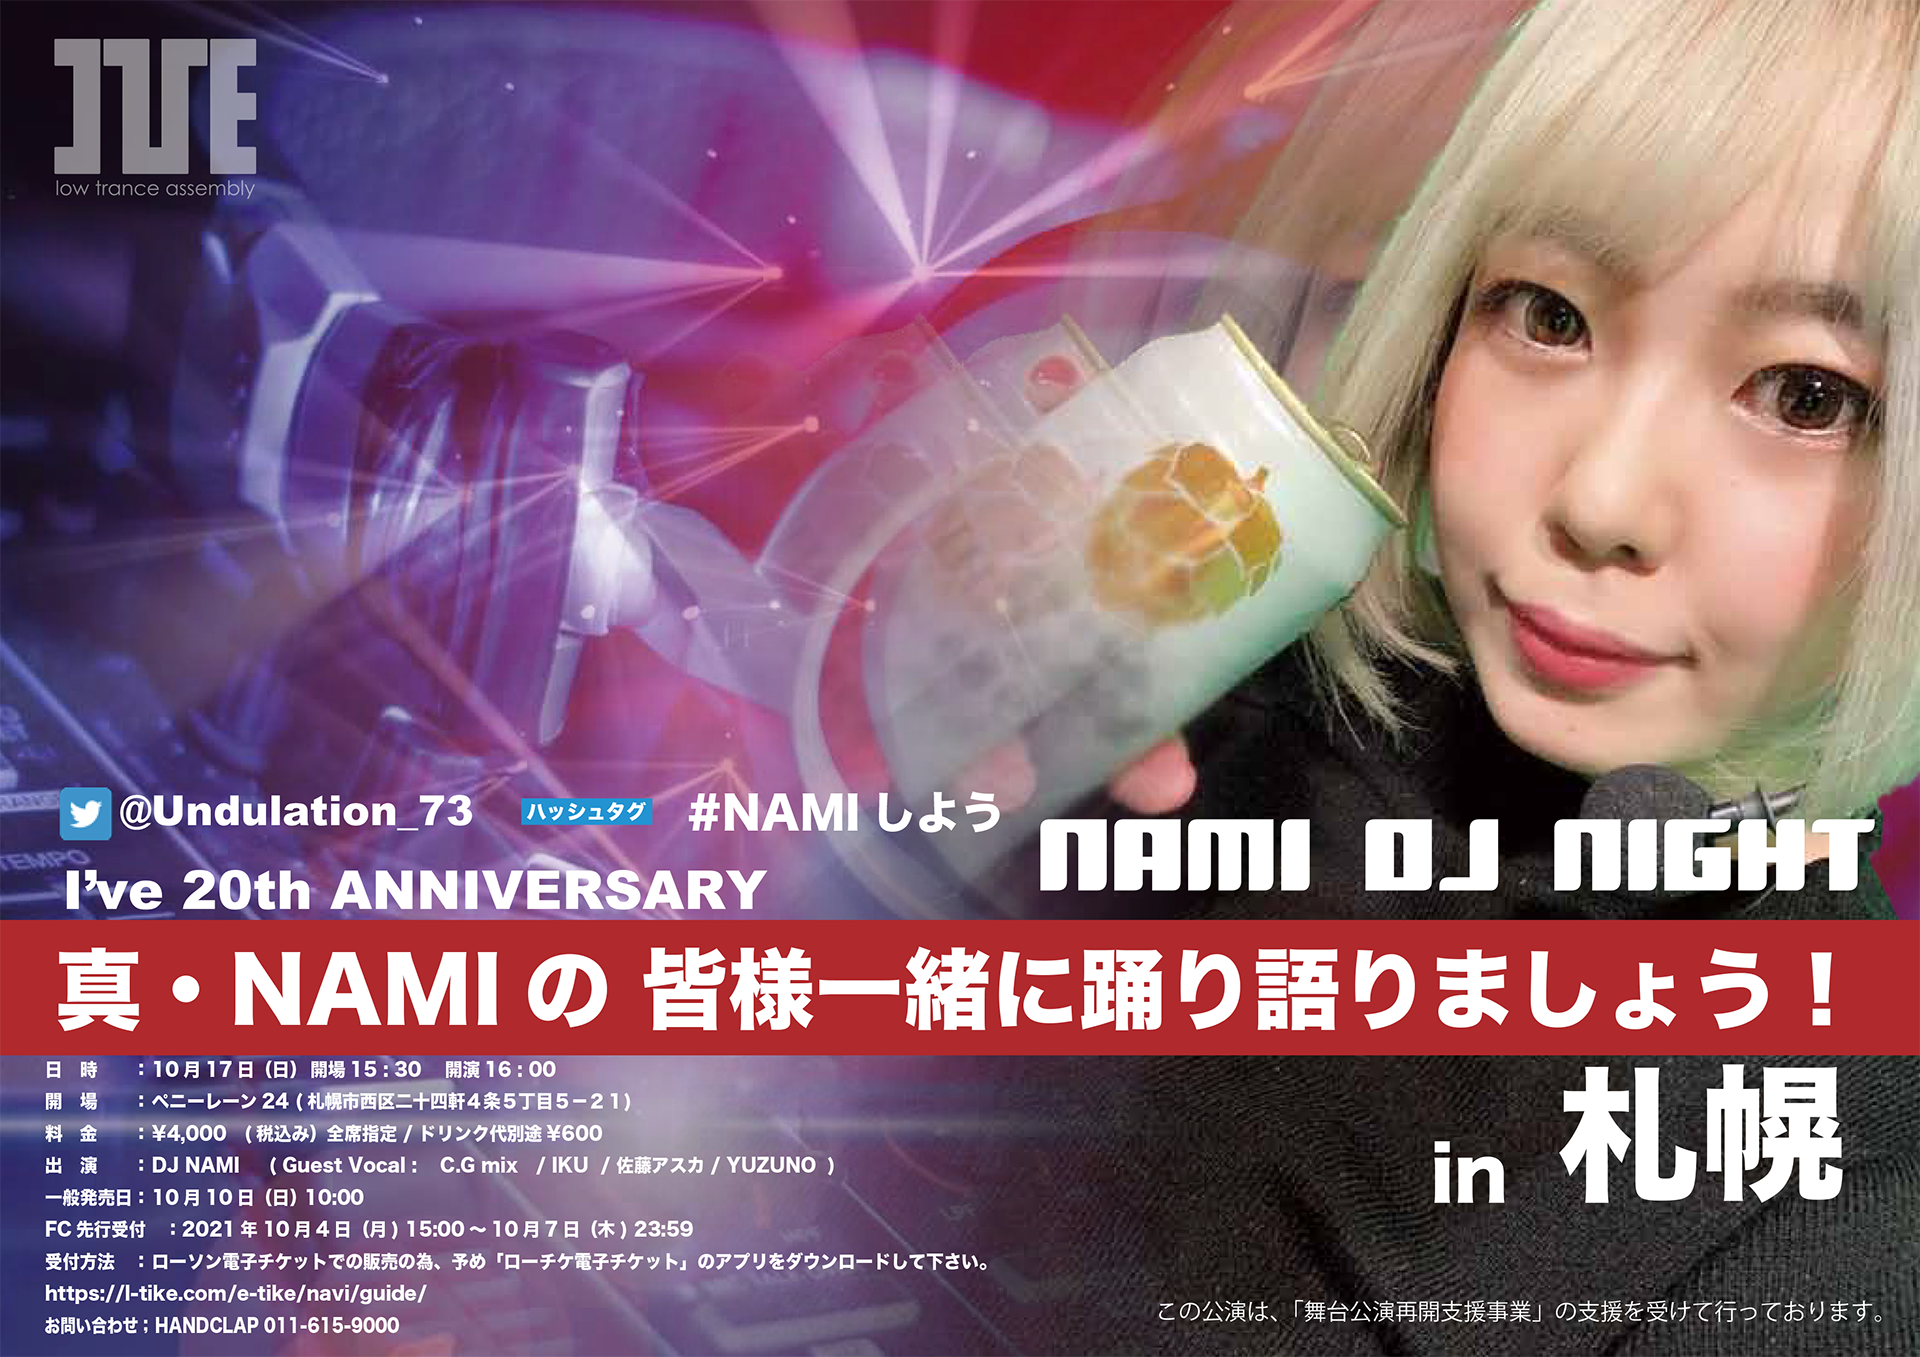 20th ANNIVERSRY  『真・NAMIの 皆様一緒に踊り語りましょう!』 in 札幌